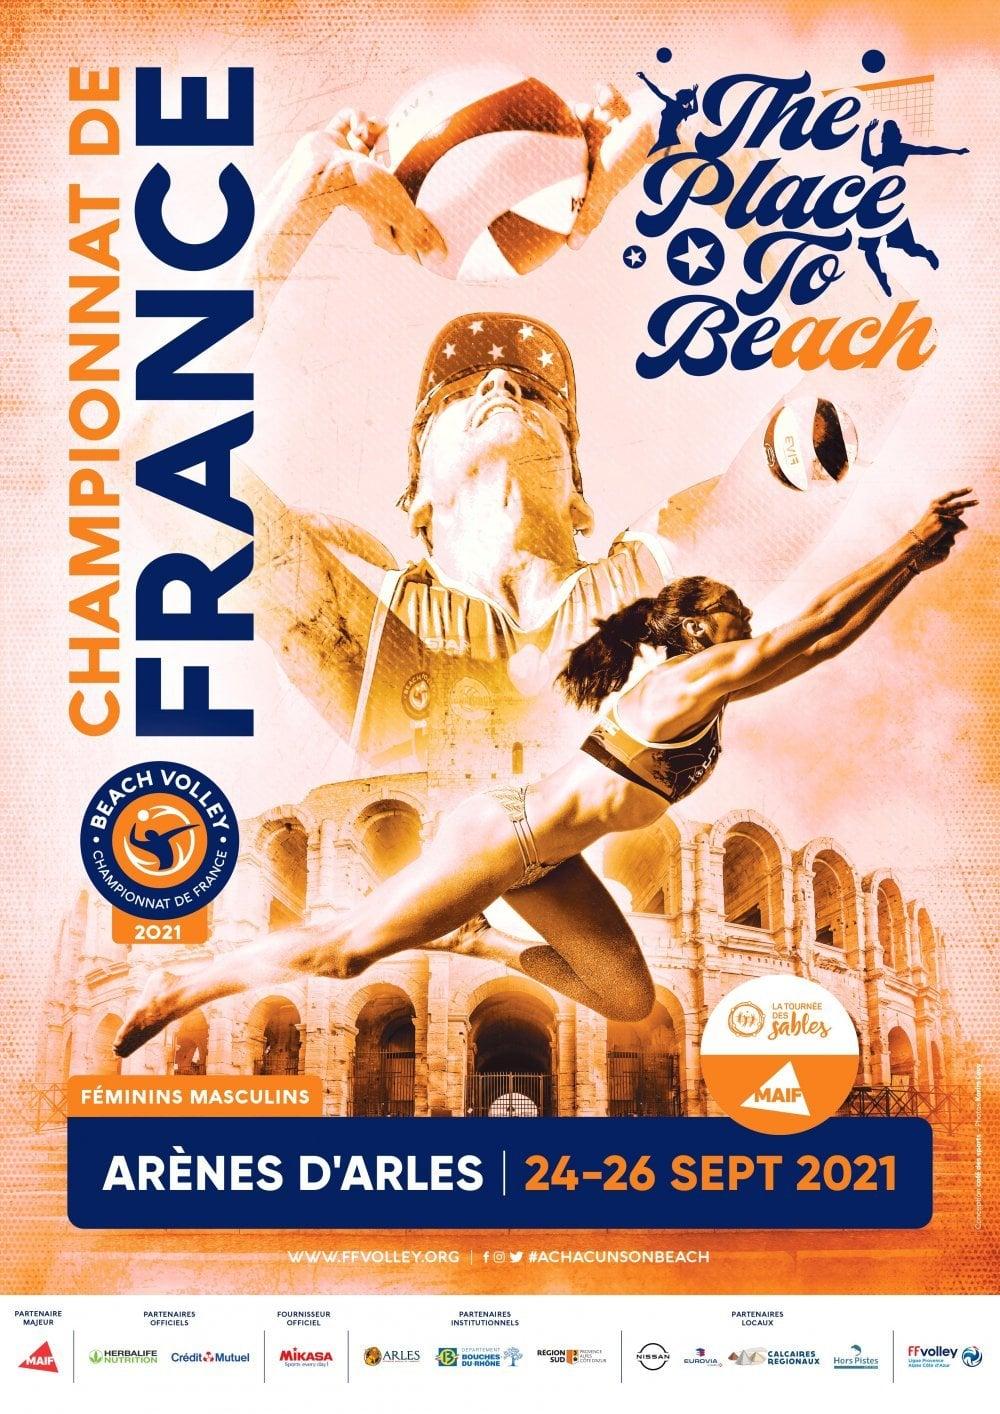 championnat france beach volley arles 2021